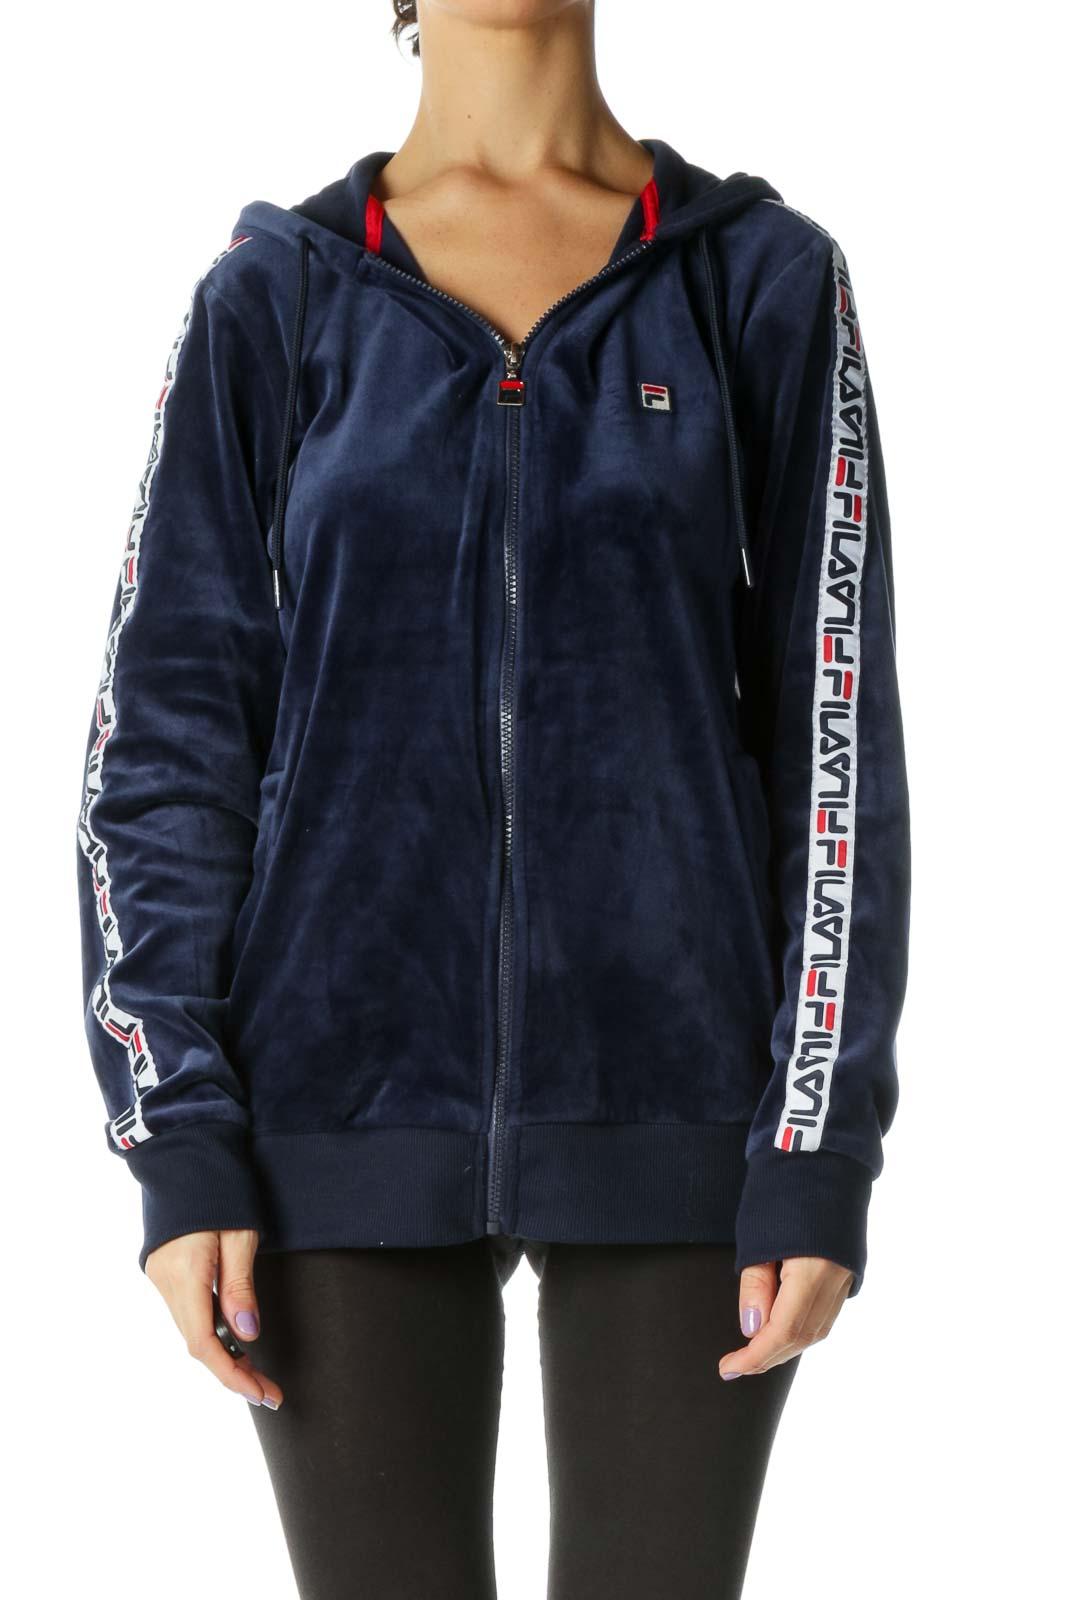 Blue Velour Jacket Front